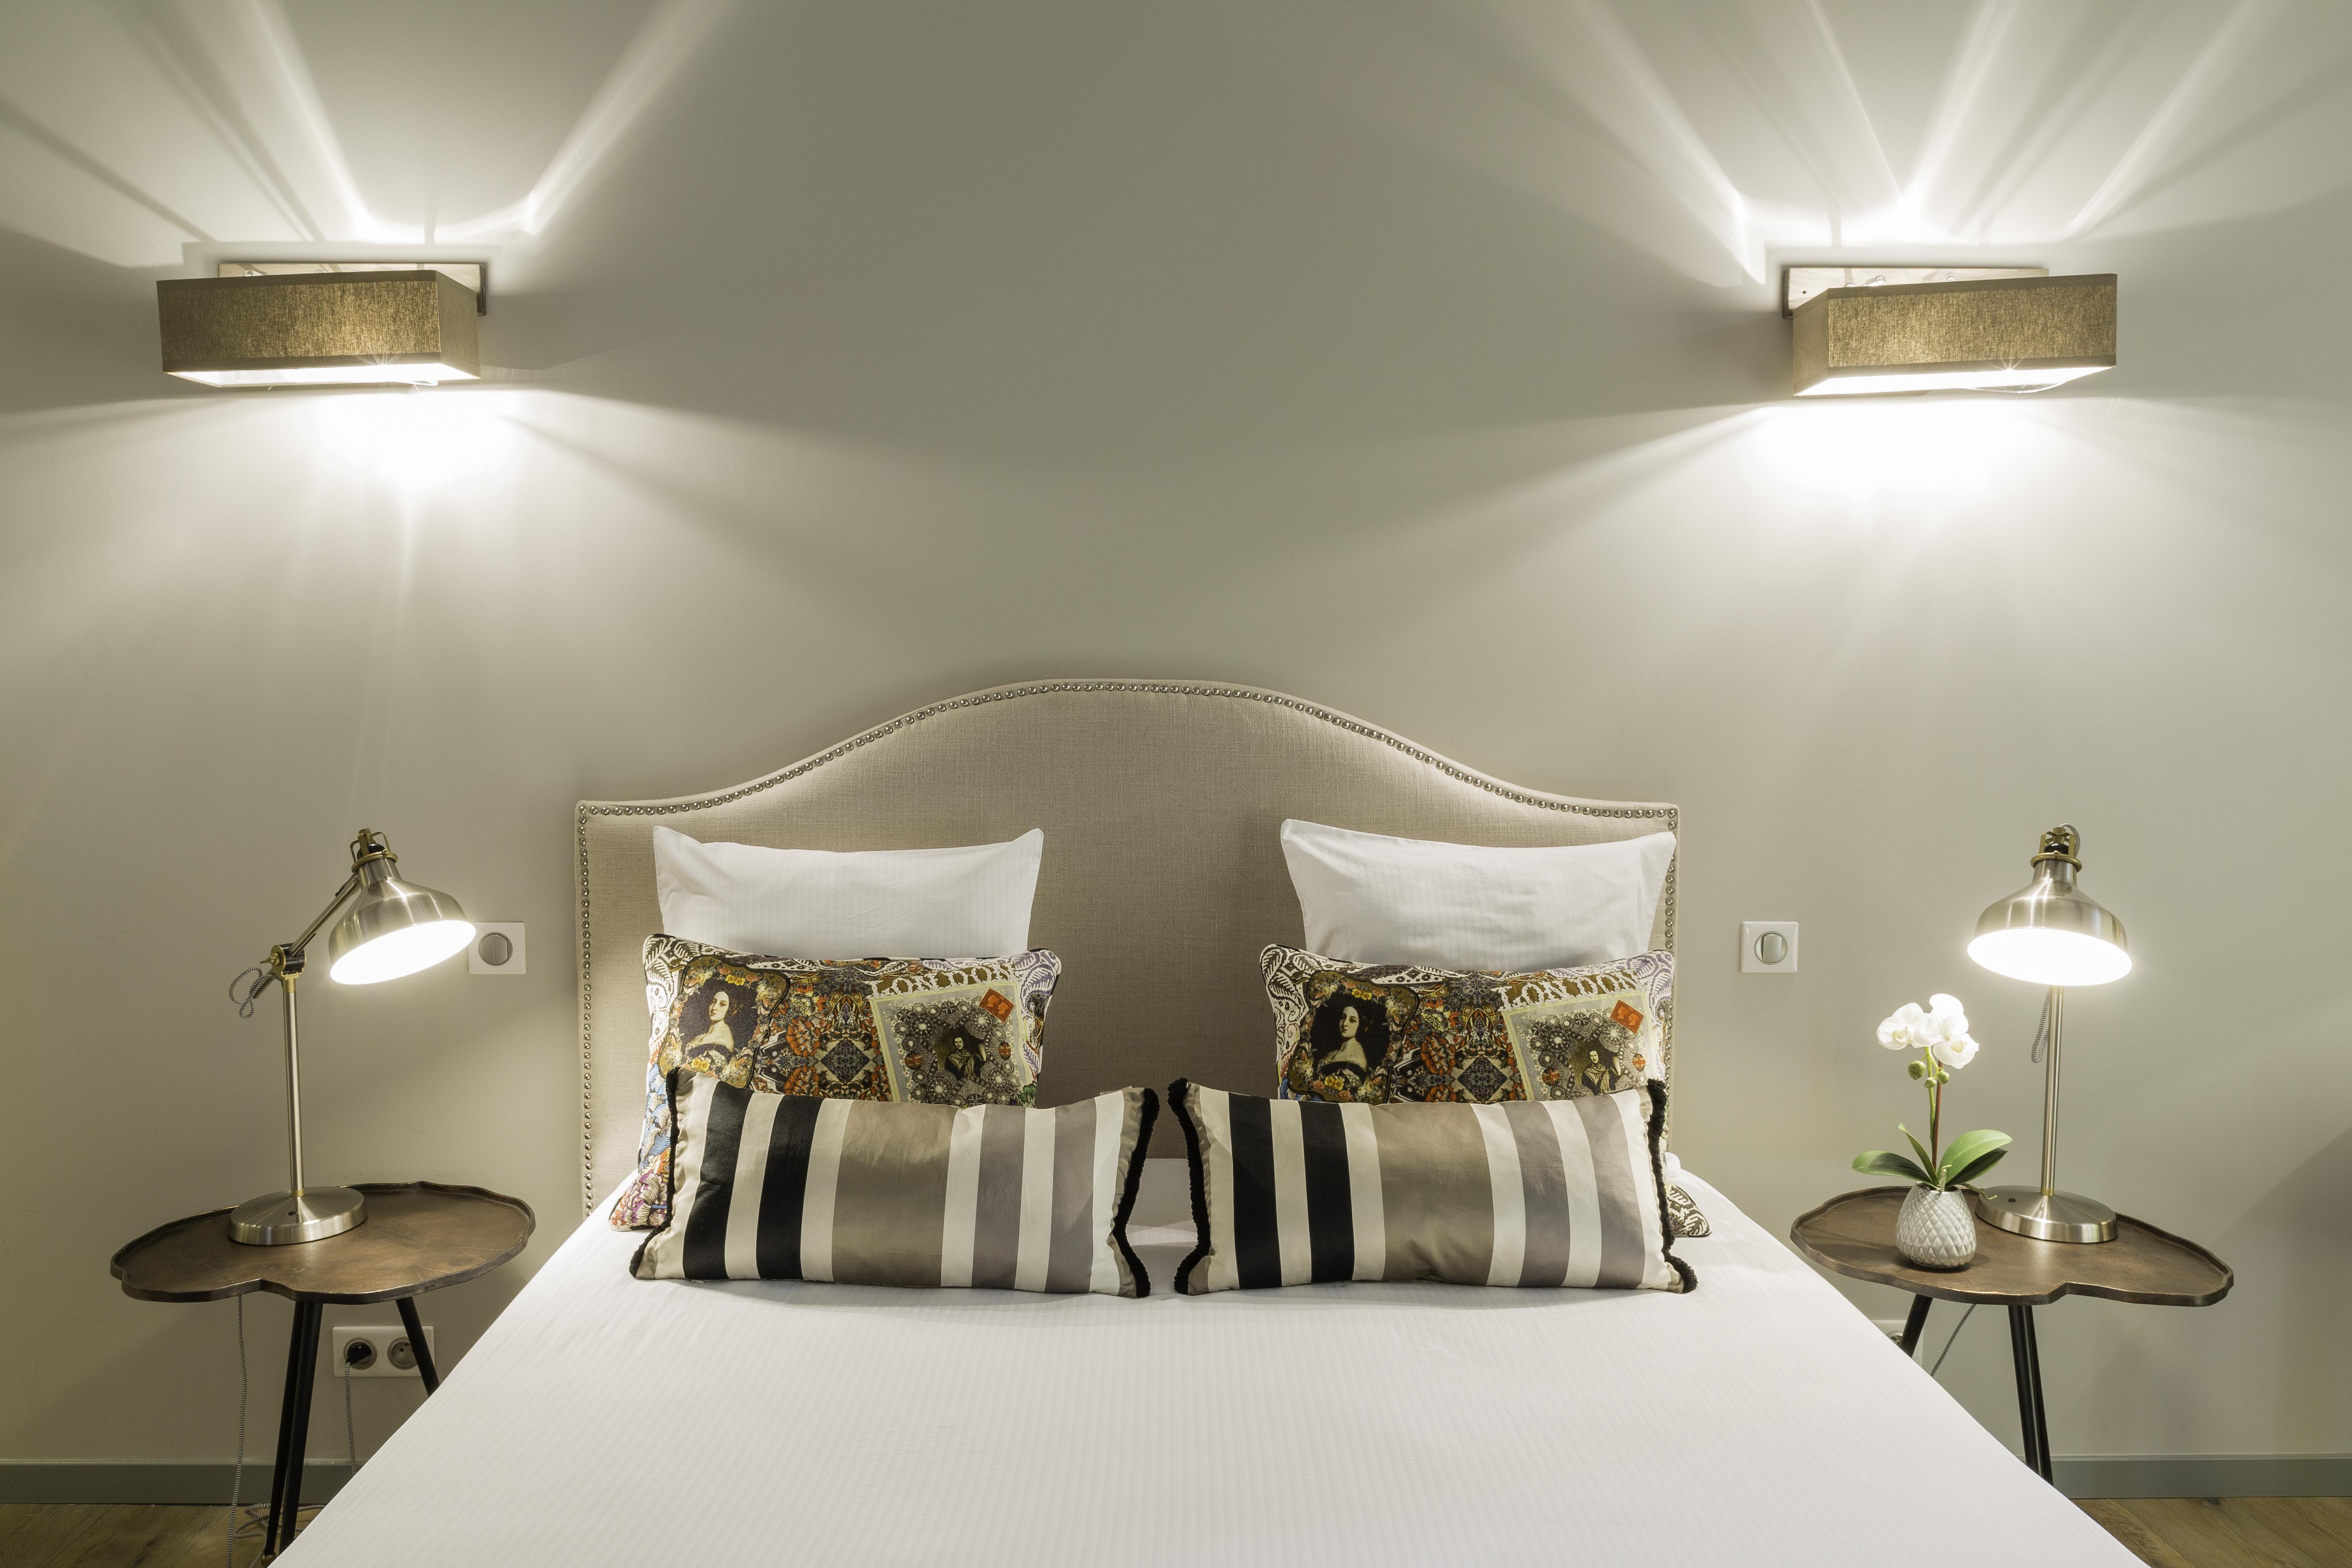 photographie-hotel-architecture-2